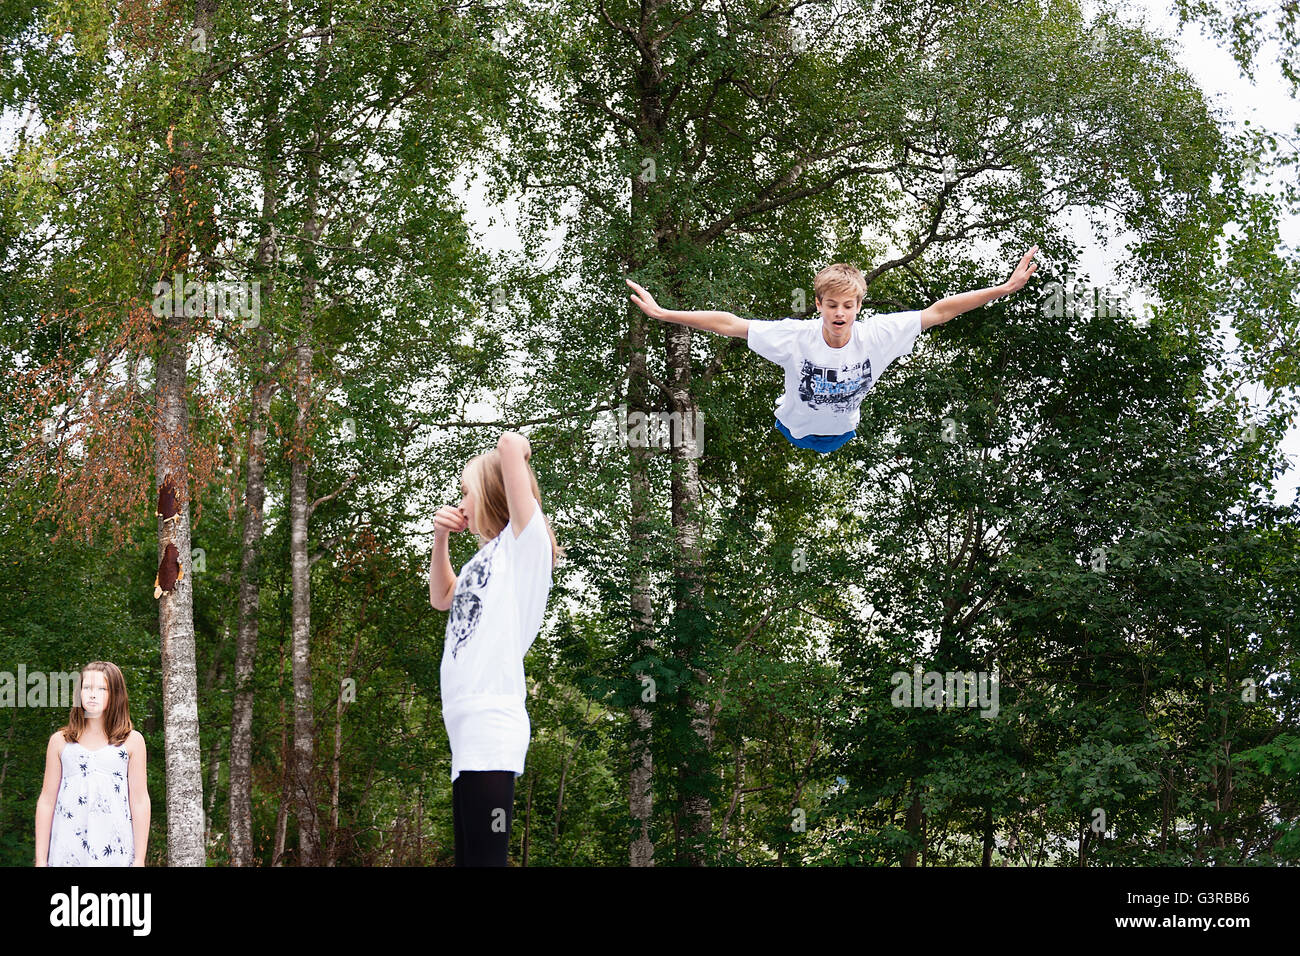 Schweden, Vastmanland, Bergslagen, Hällefors, Nygard, Kinder (10-11, 12-13, 14-15) gegen grüne Bäume Stockbild